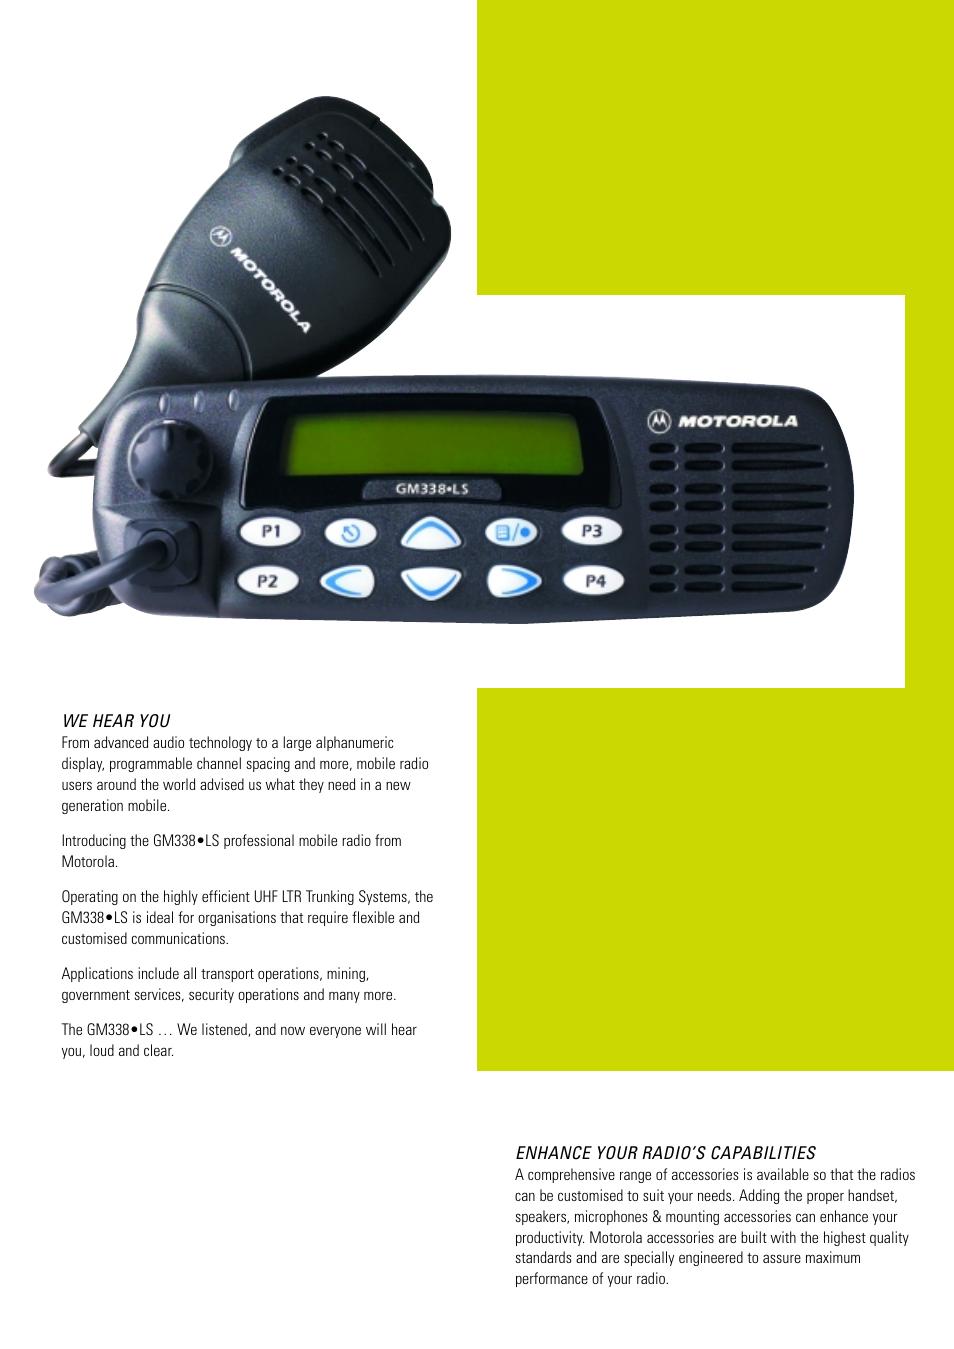 Motorola PROFESSIONAL MOBILE RADIO GM338LS User Manual